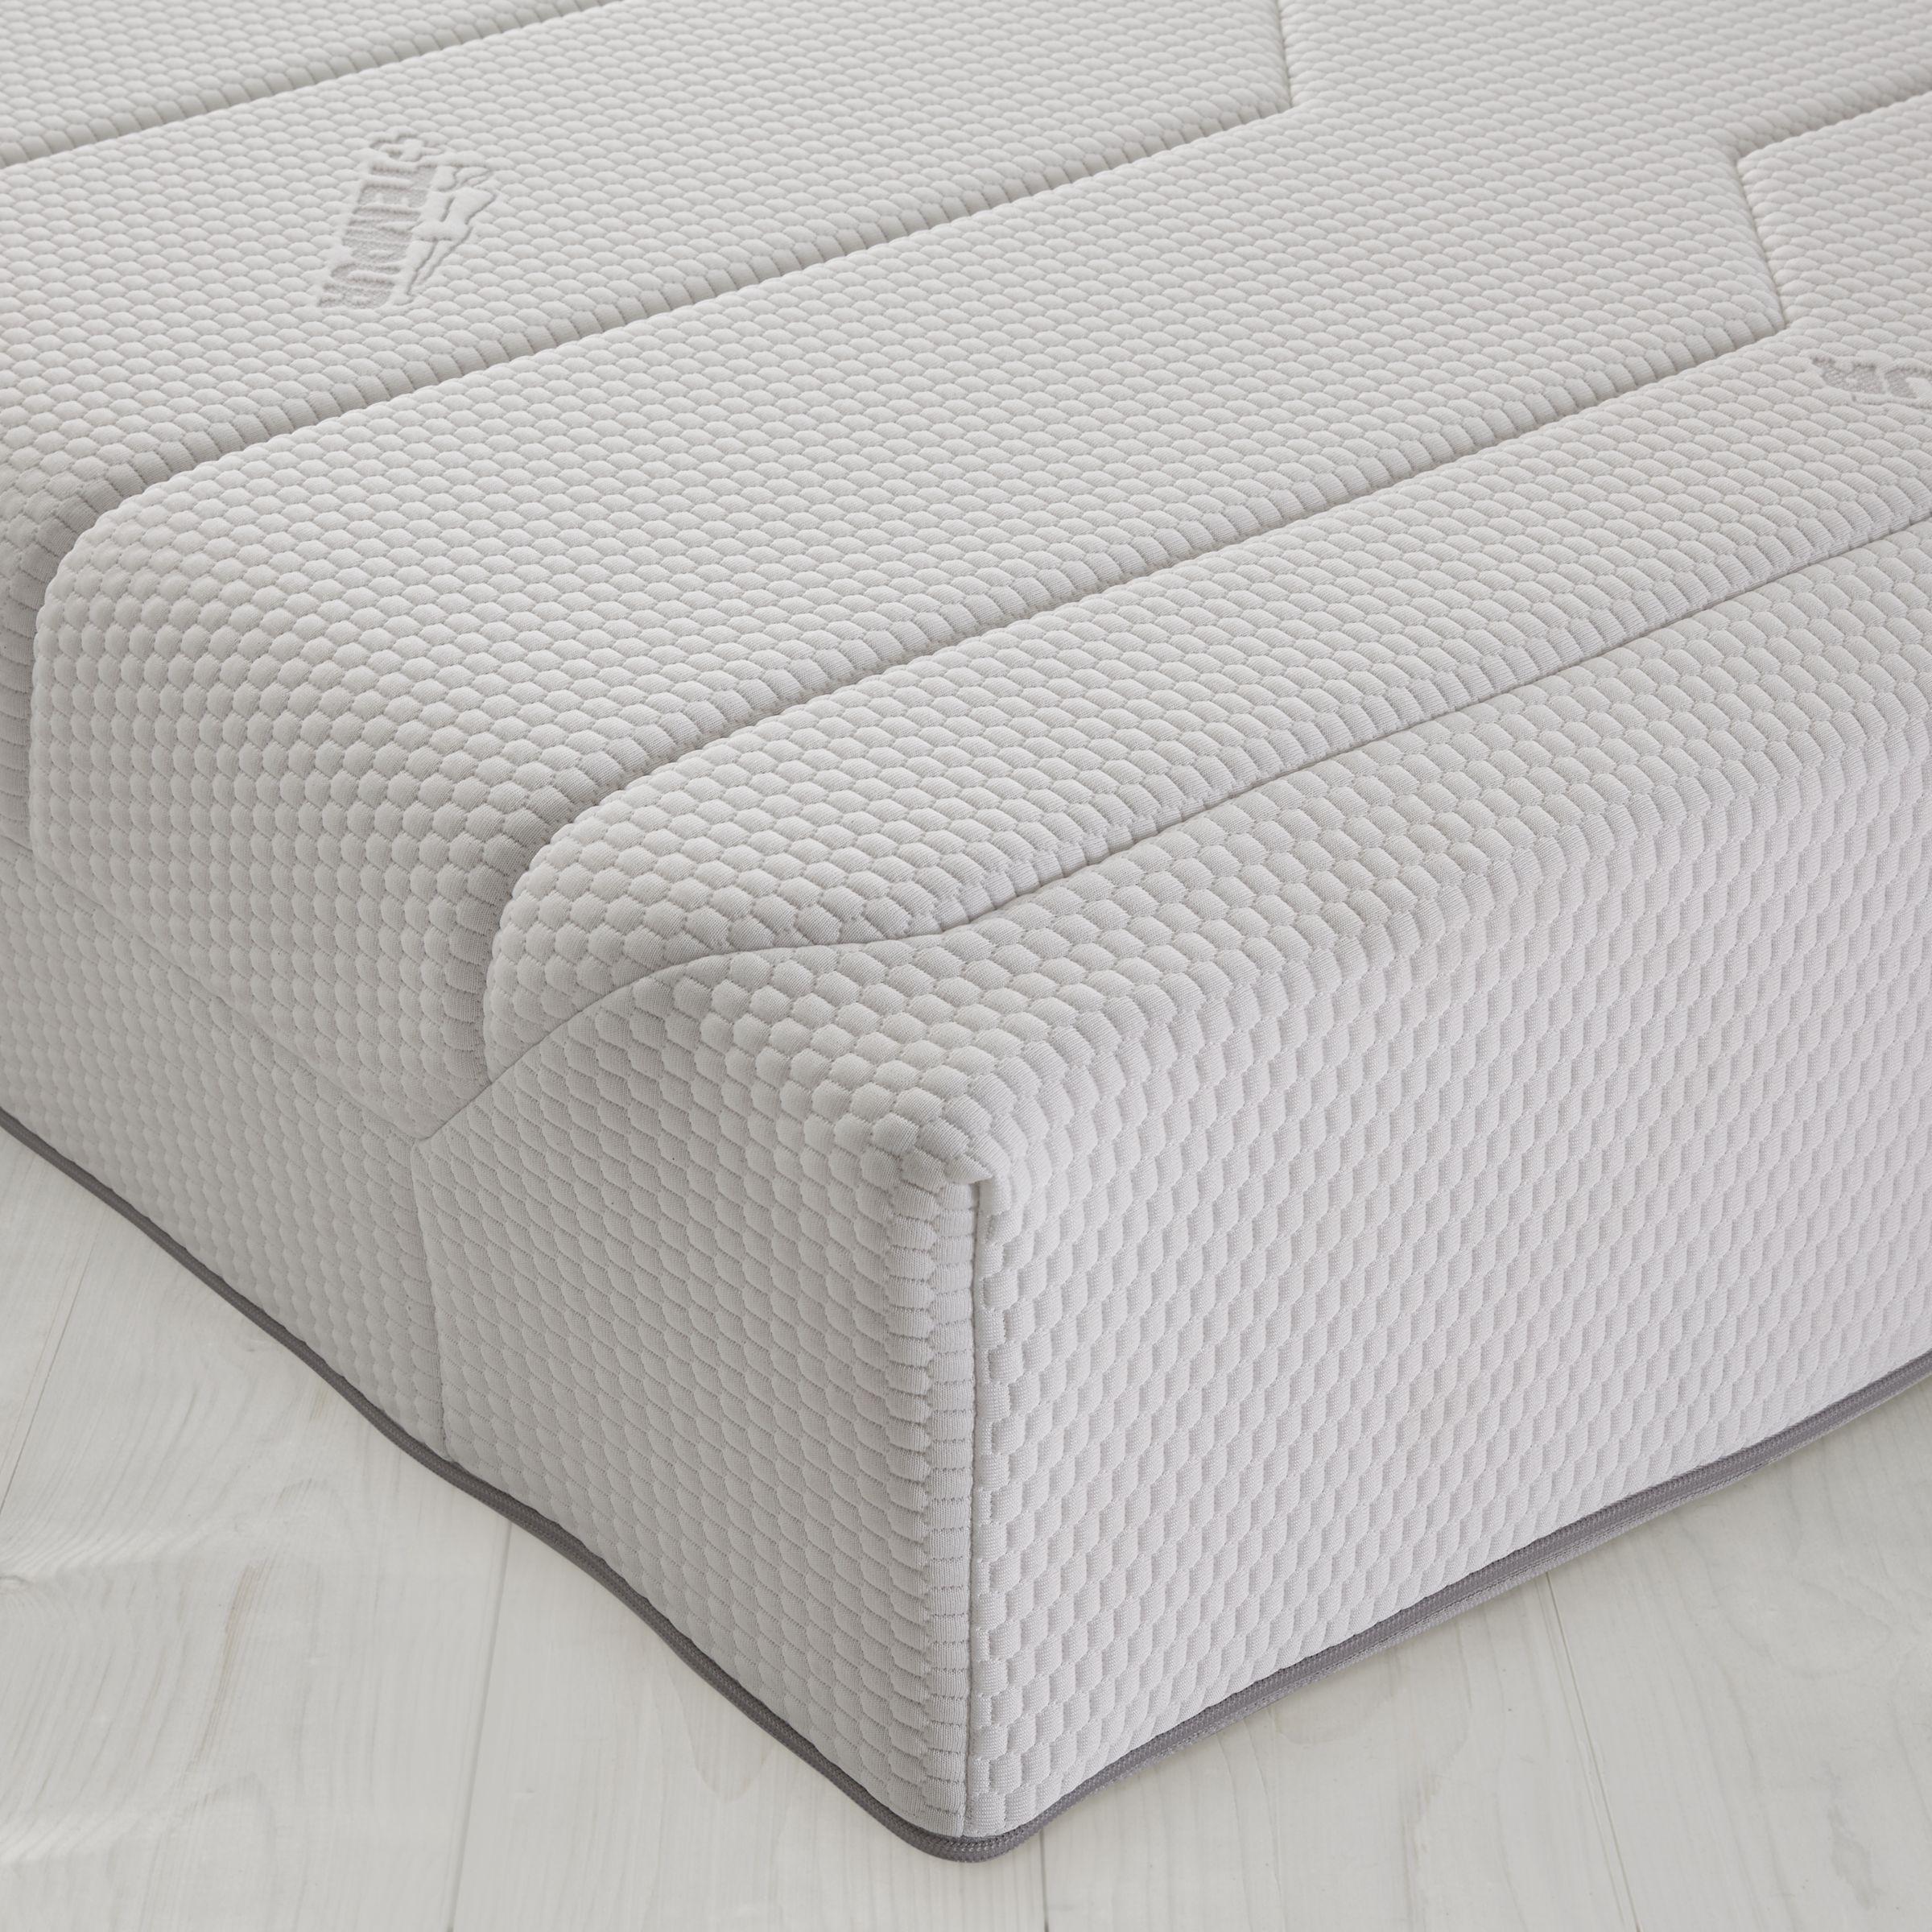 Tempur mattress price parison results